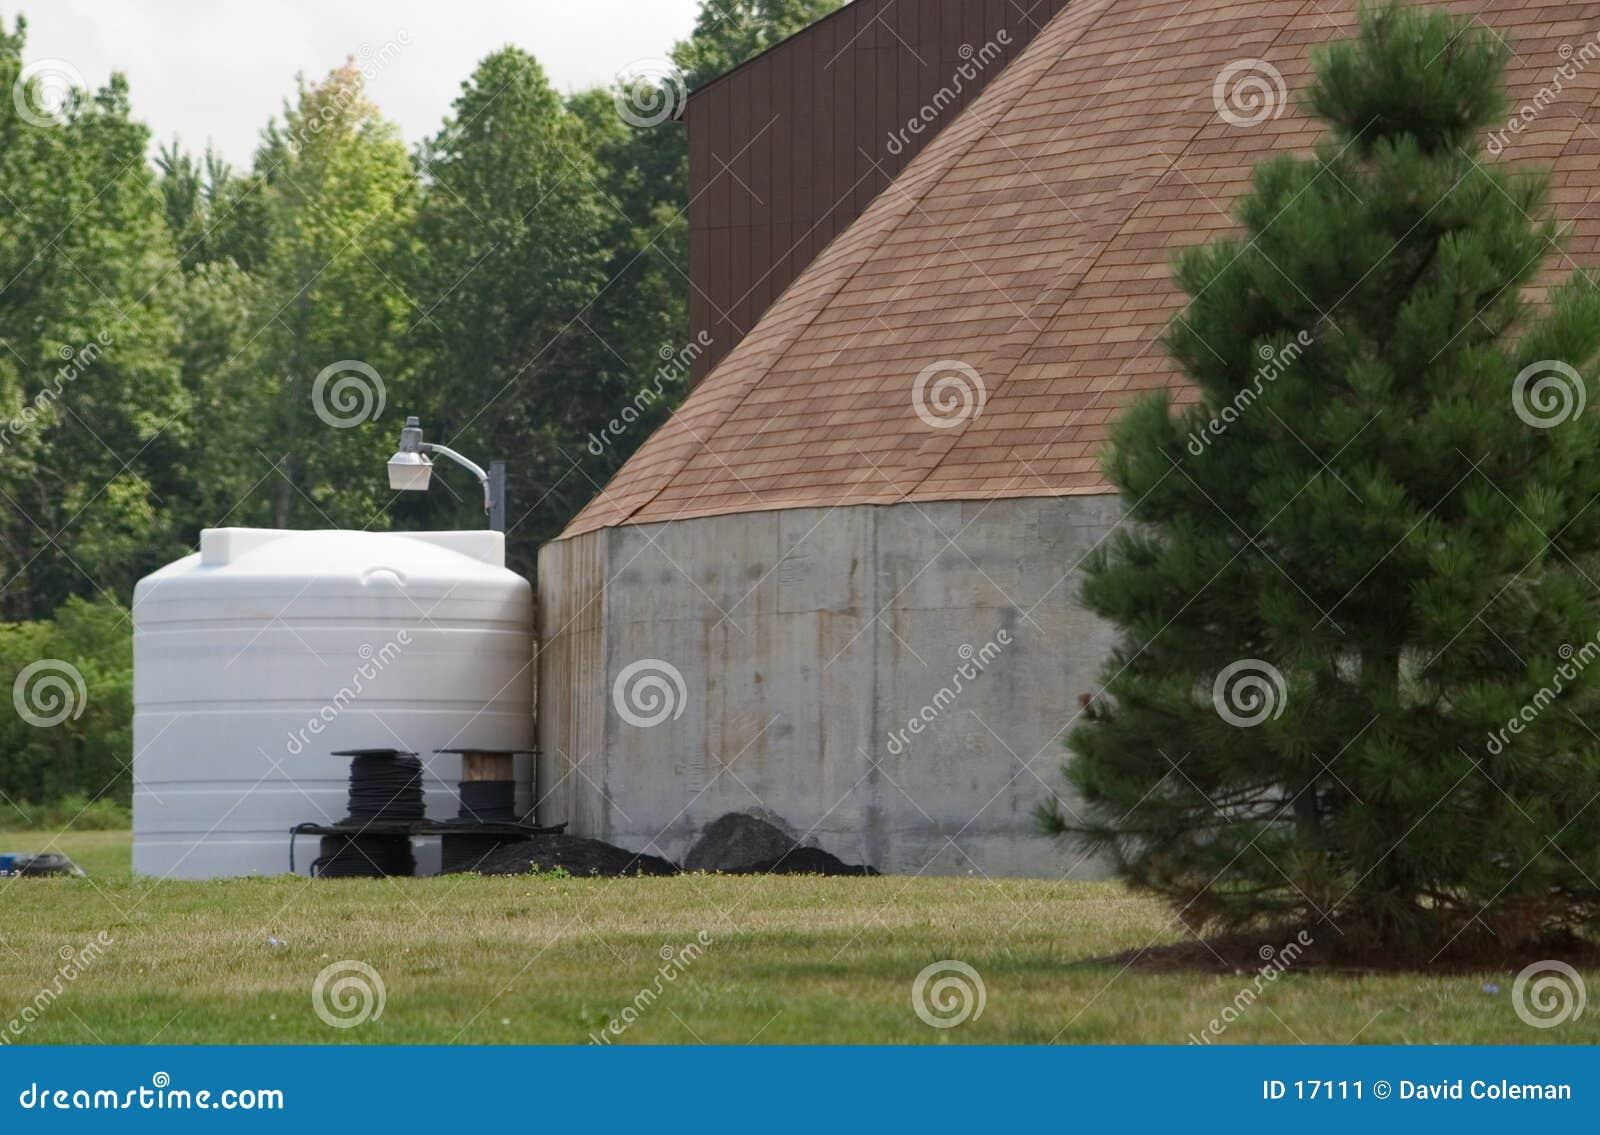 Storage tank beside building